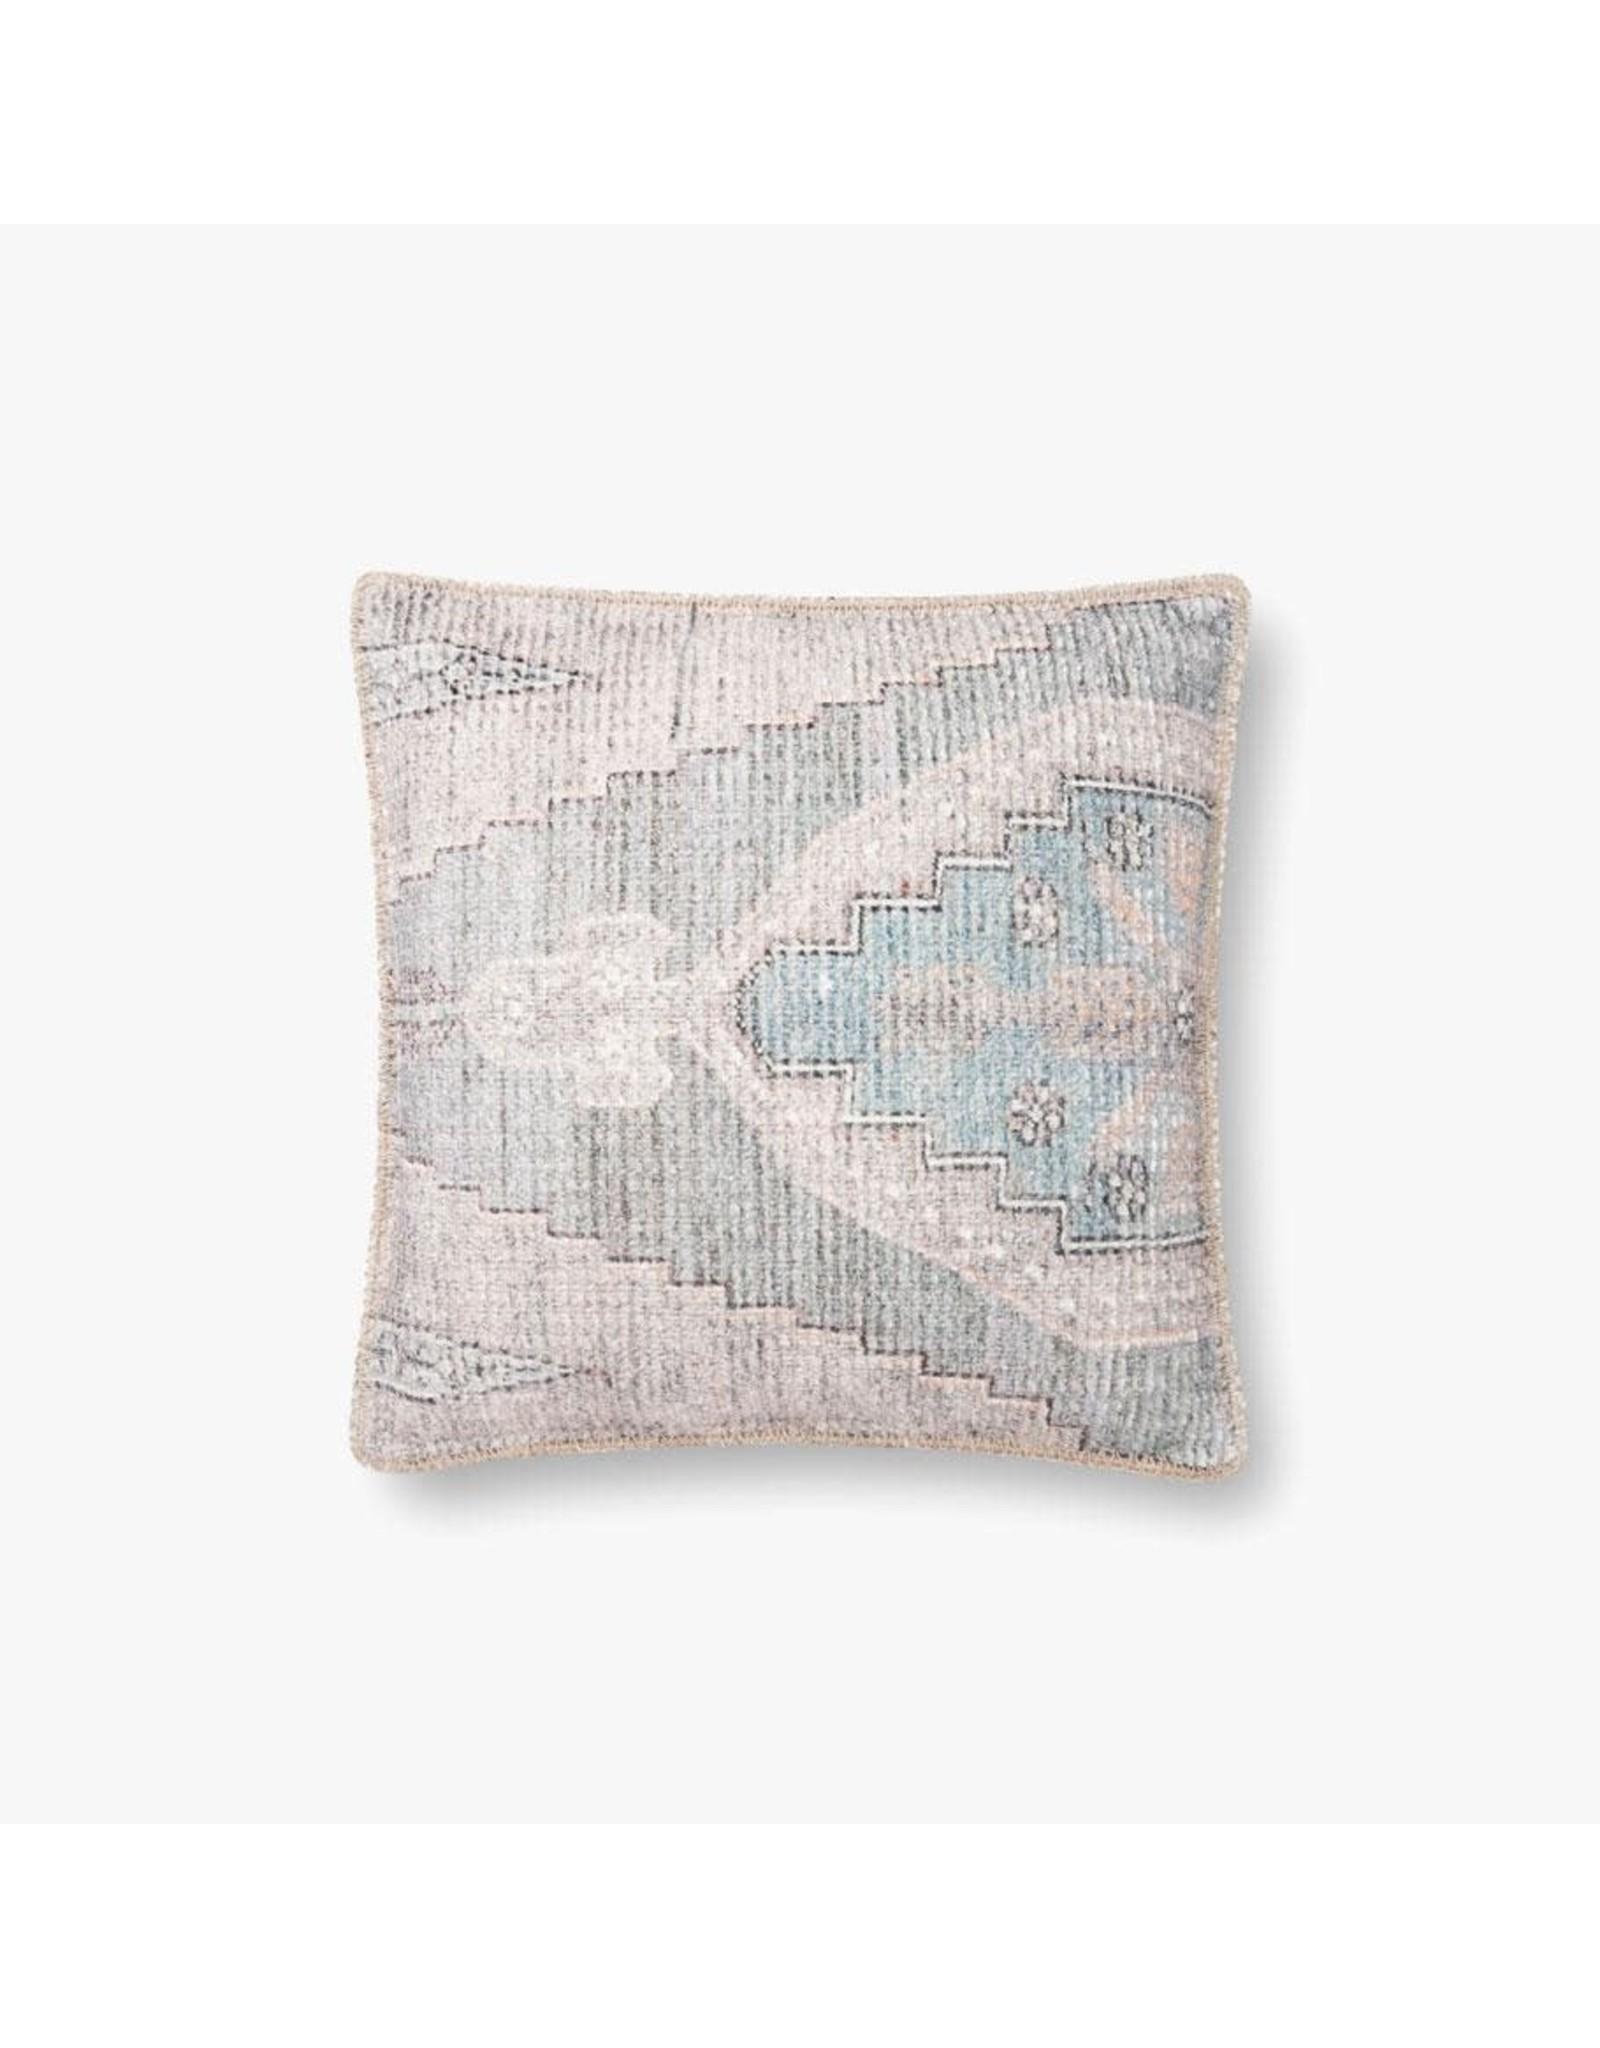 "Oak + Arrow Interiors Blue Vintage Print Pillow 18x18"""